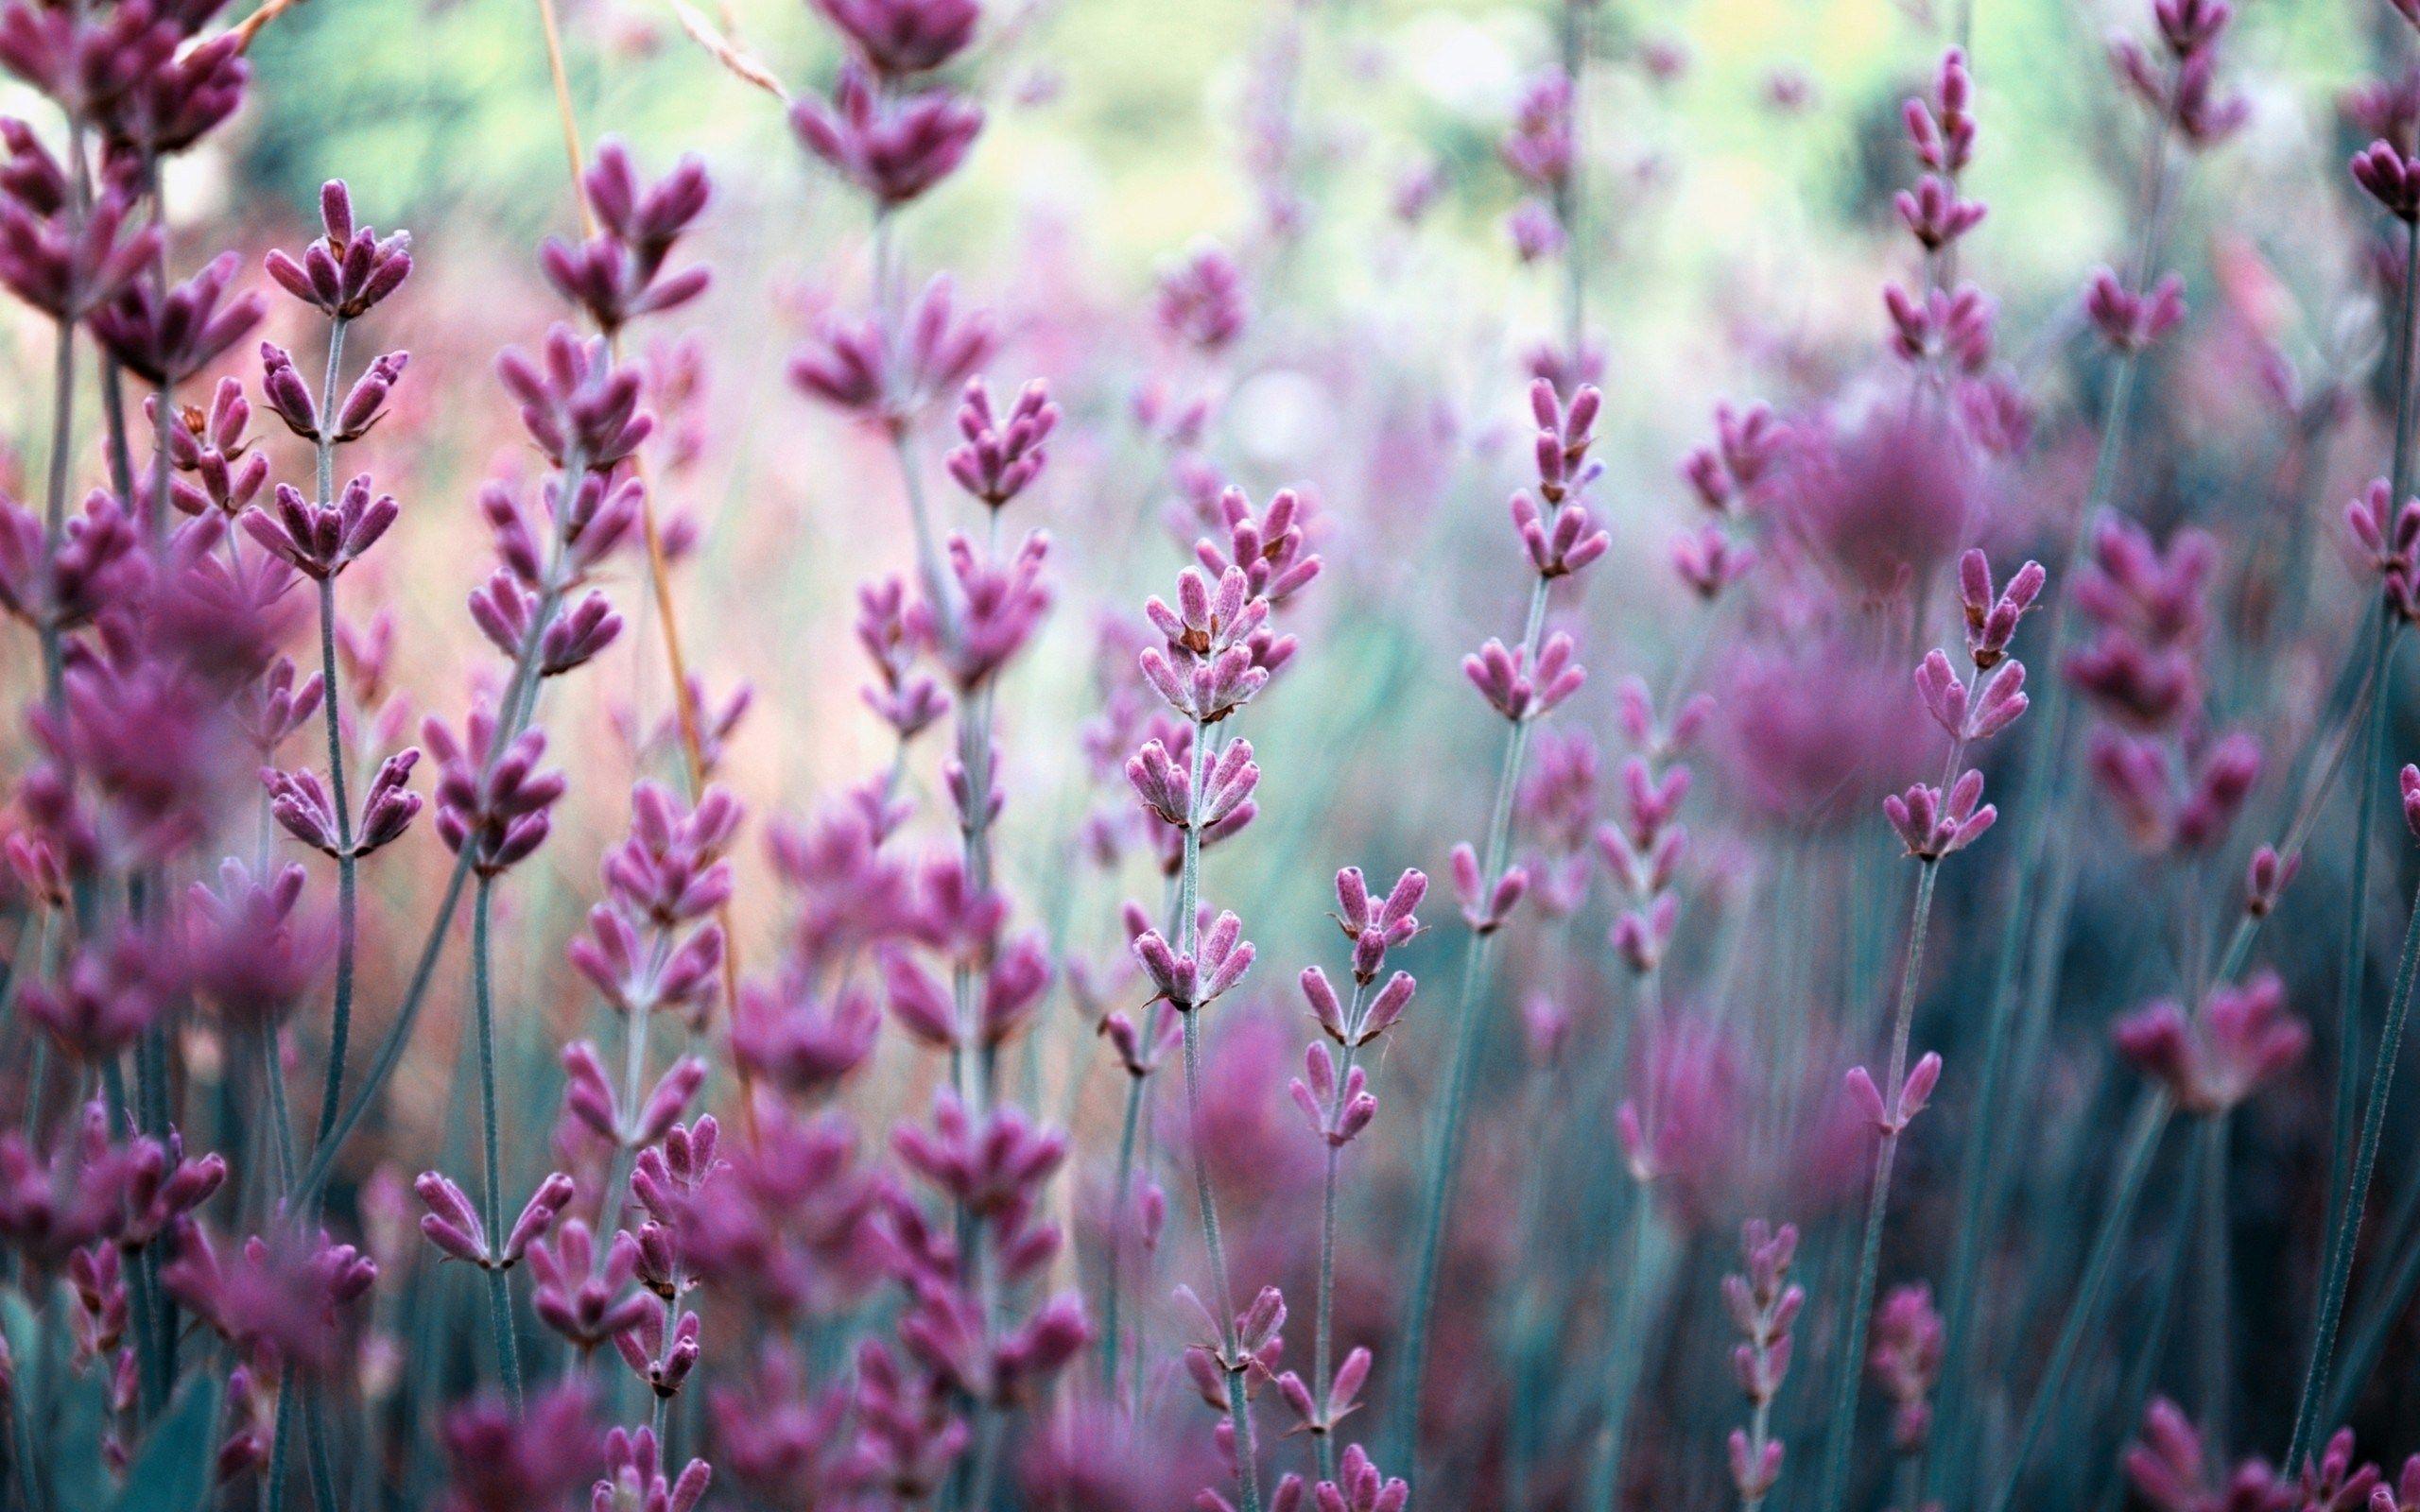 Beautiful Lavender Wallpaper: HD Lavender Mobile Background - http ...